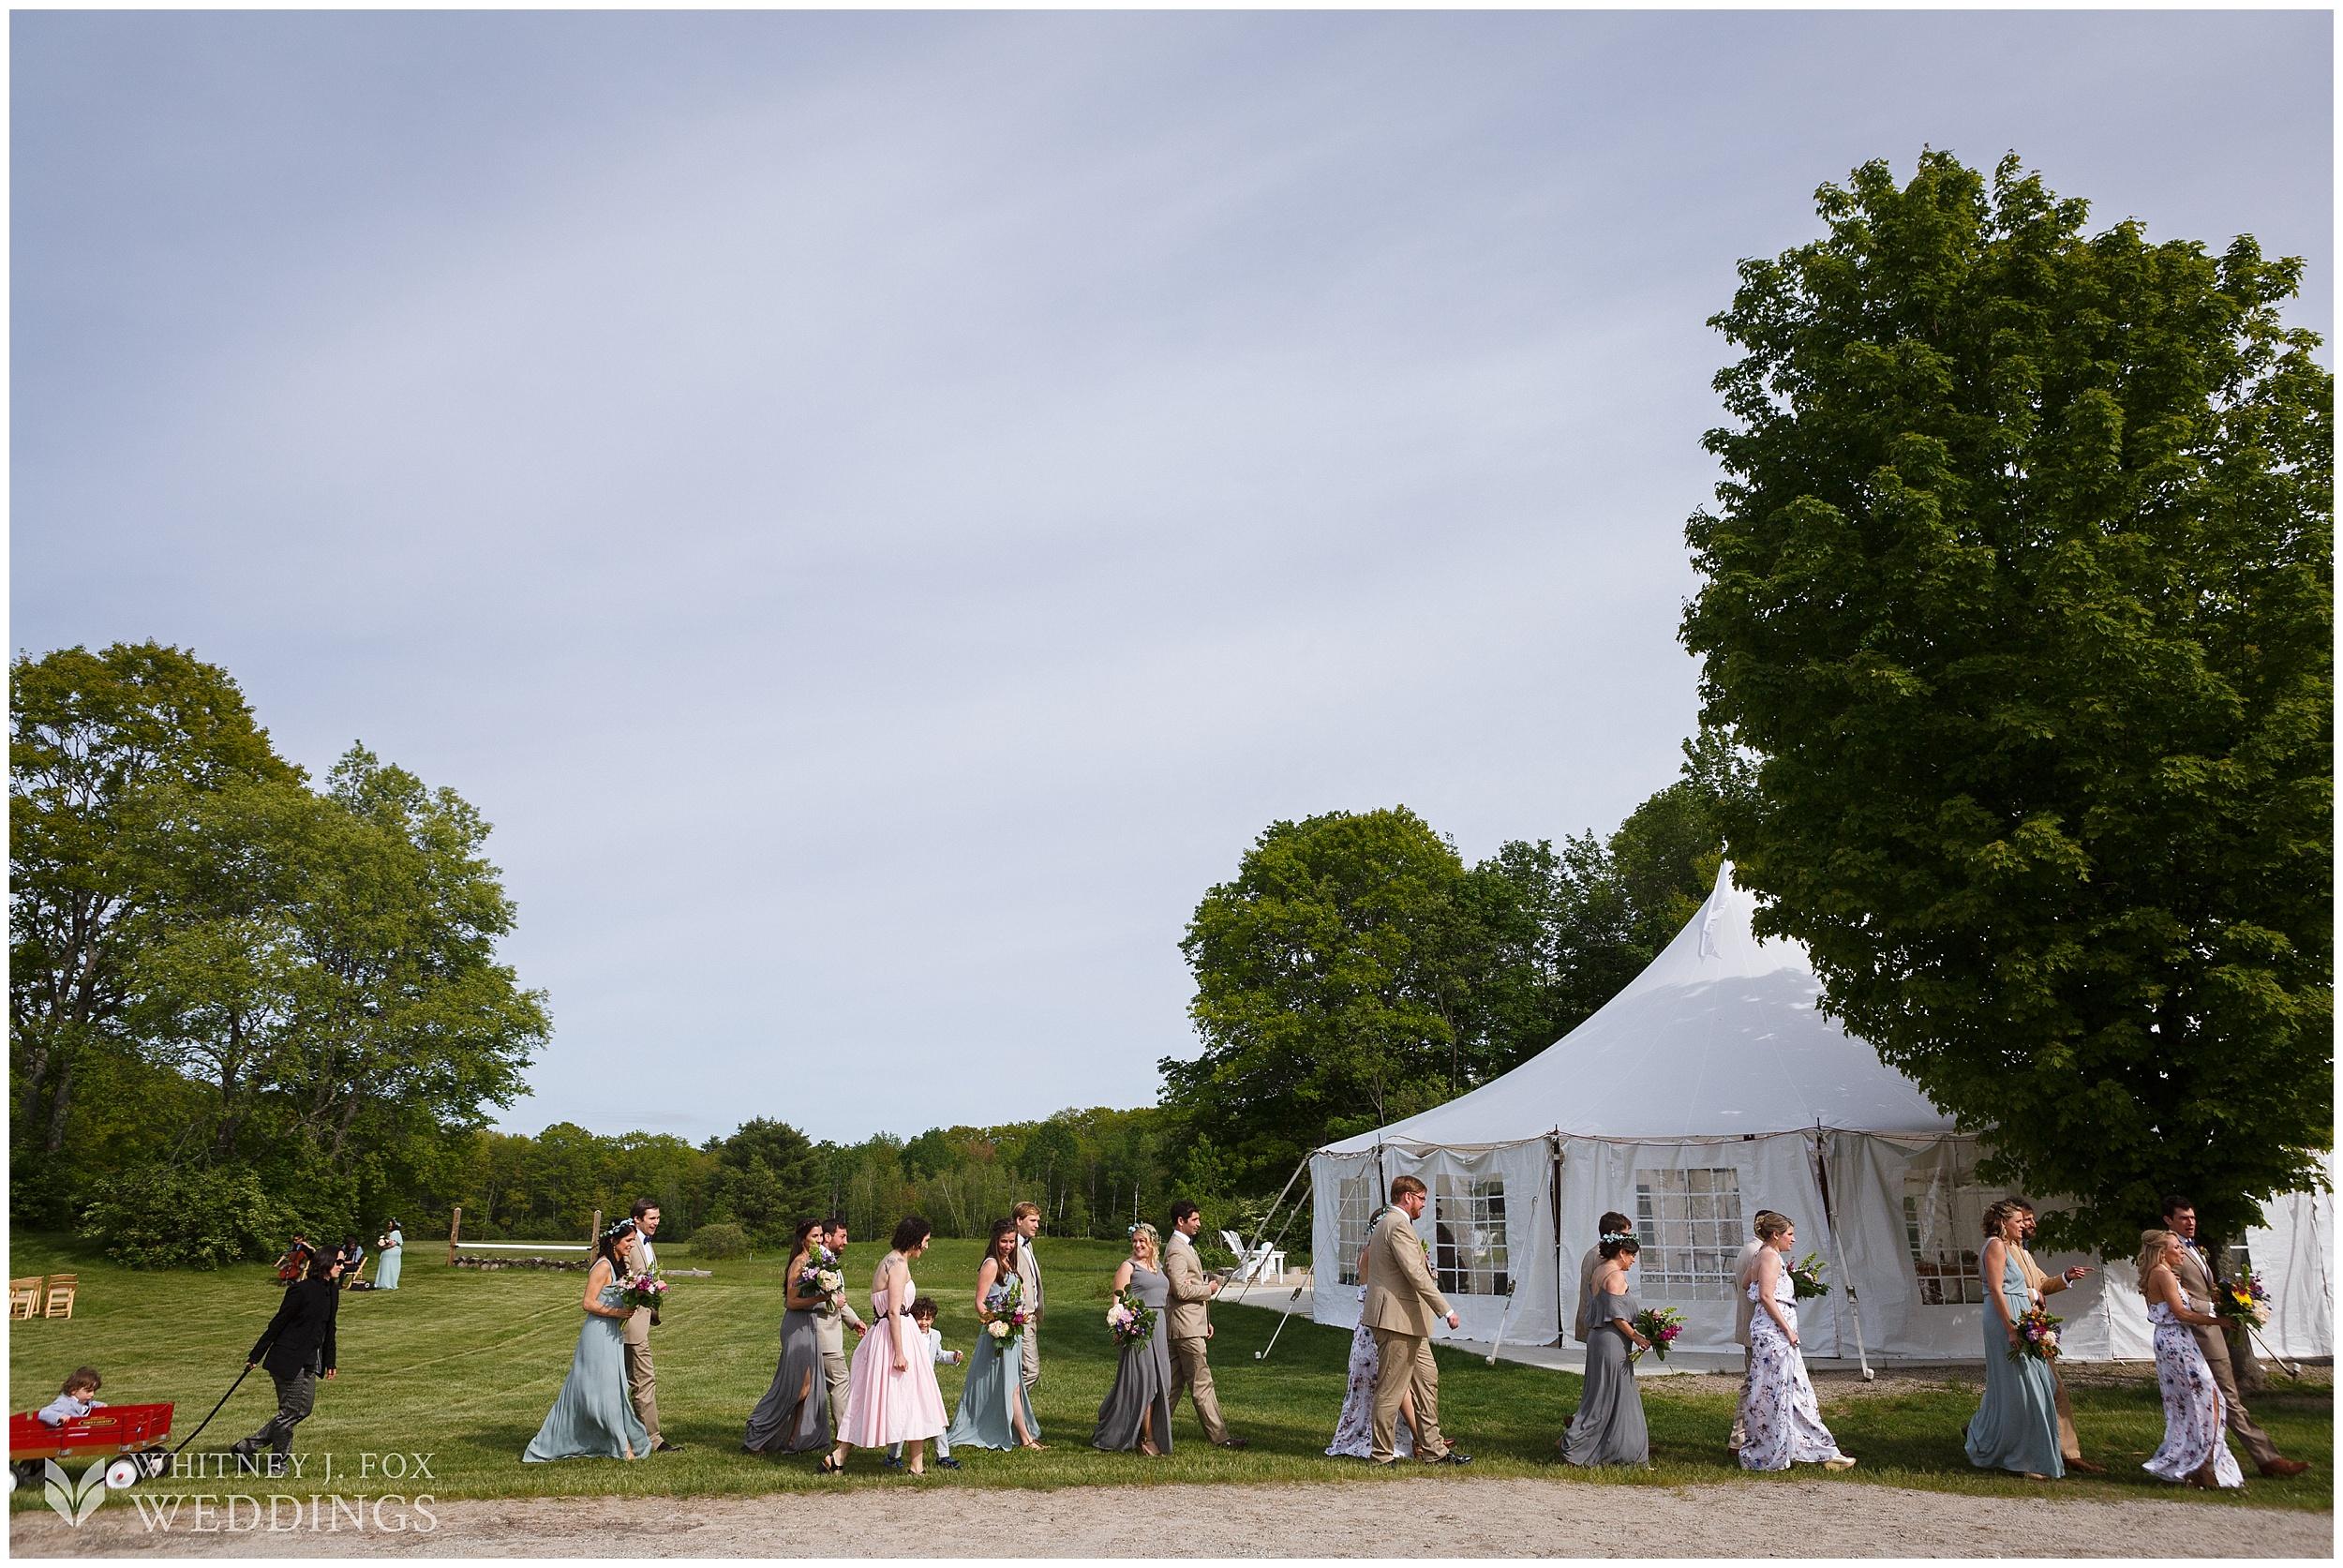 45_82_tai_josh_the_homestead_rest_be_thankful_farm_lyman_maine_photographer_whitney_j_fox_weddings_9924.jpg